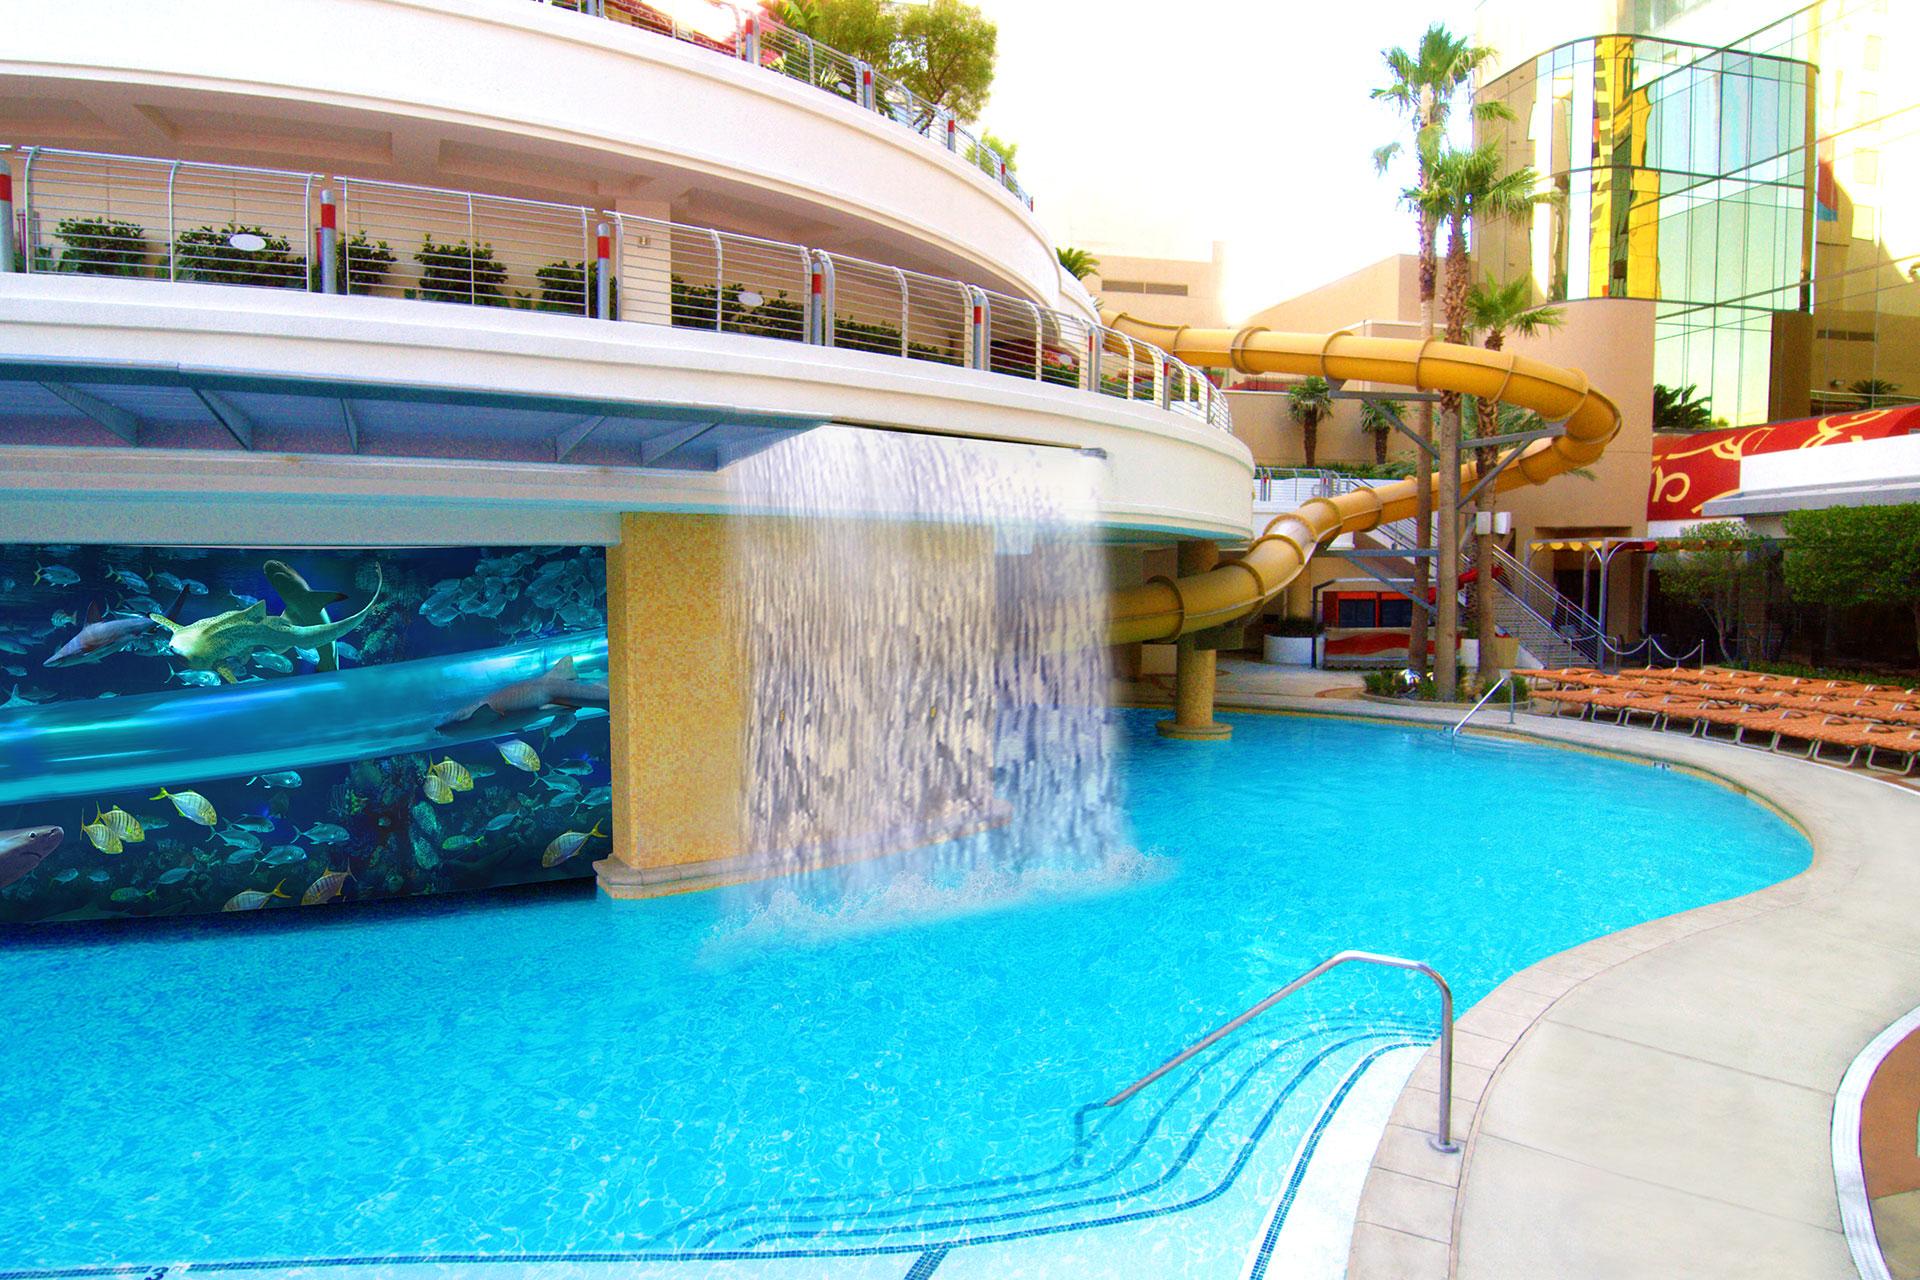 Pool at Golden Nugget Hotel in Las Vegas